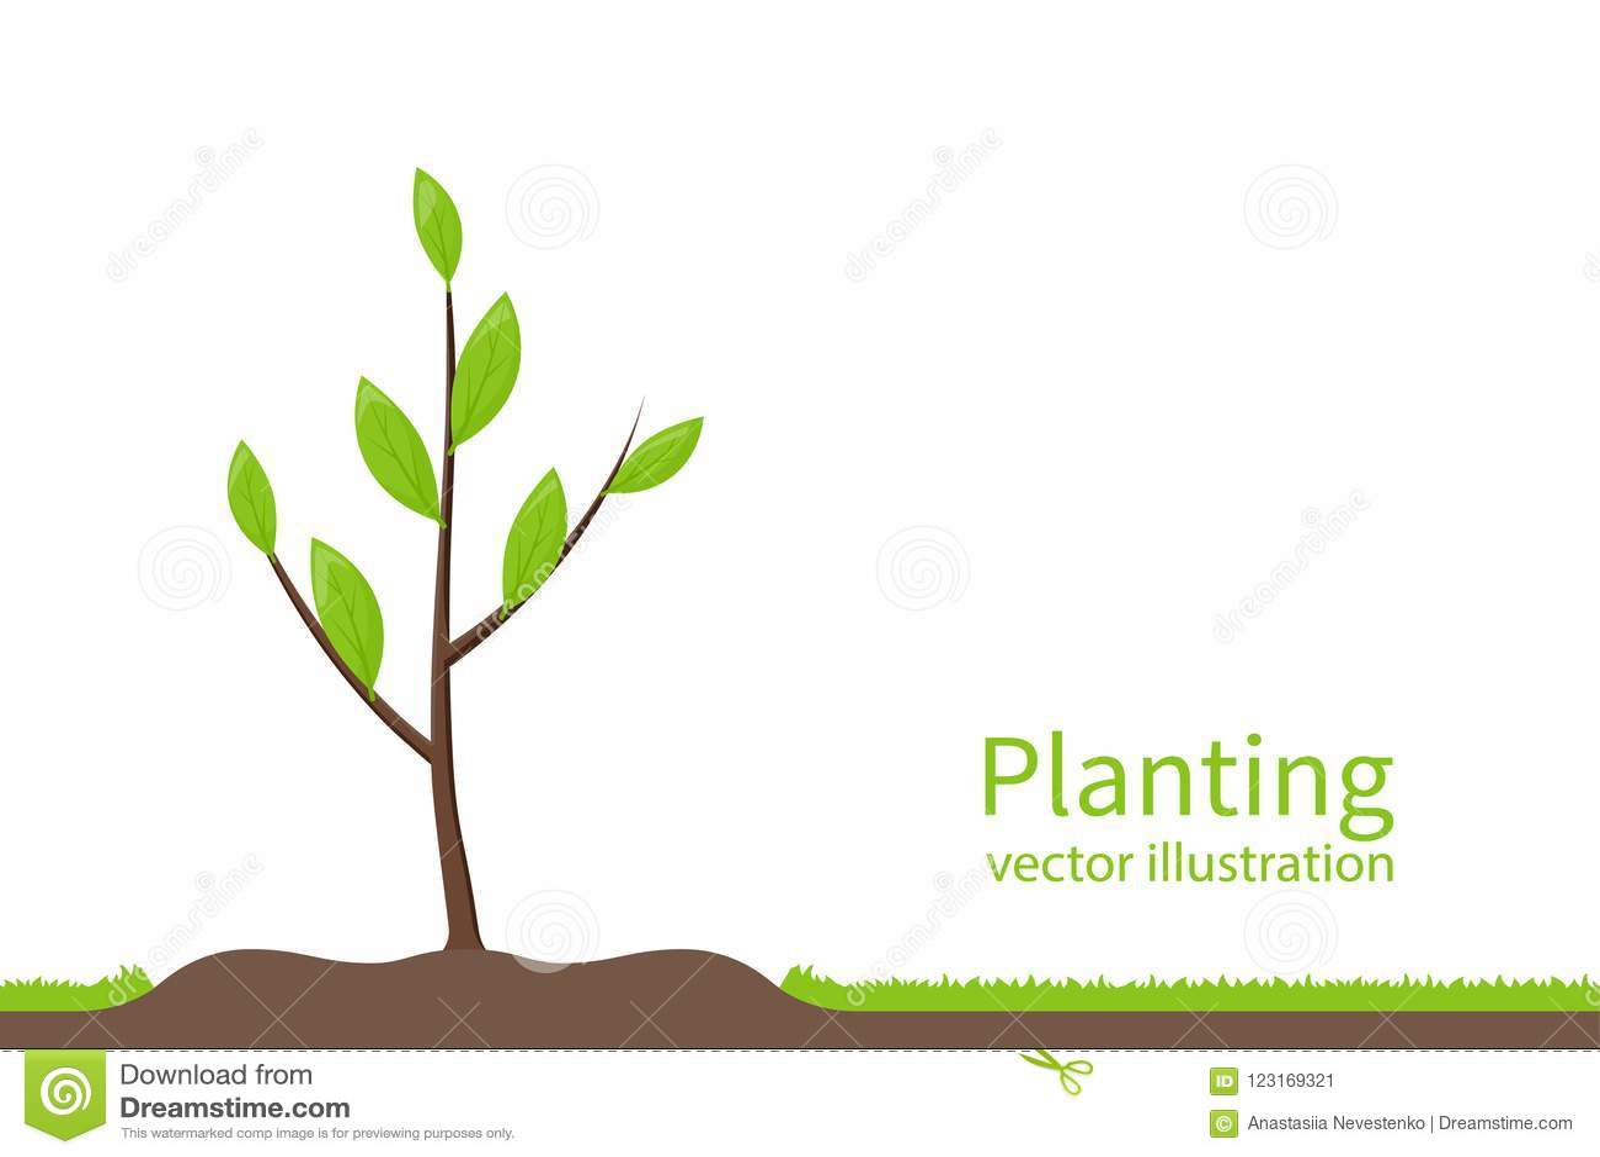 Planting tree. Process planting concept